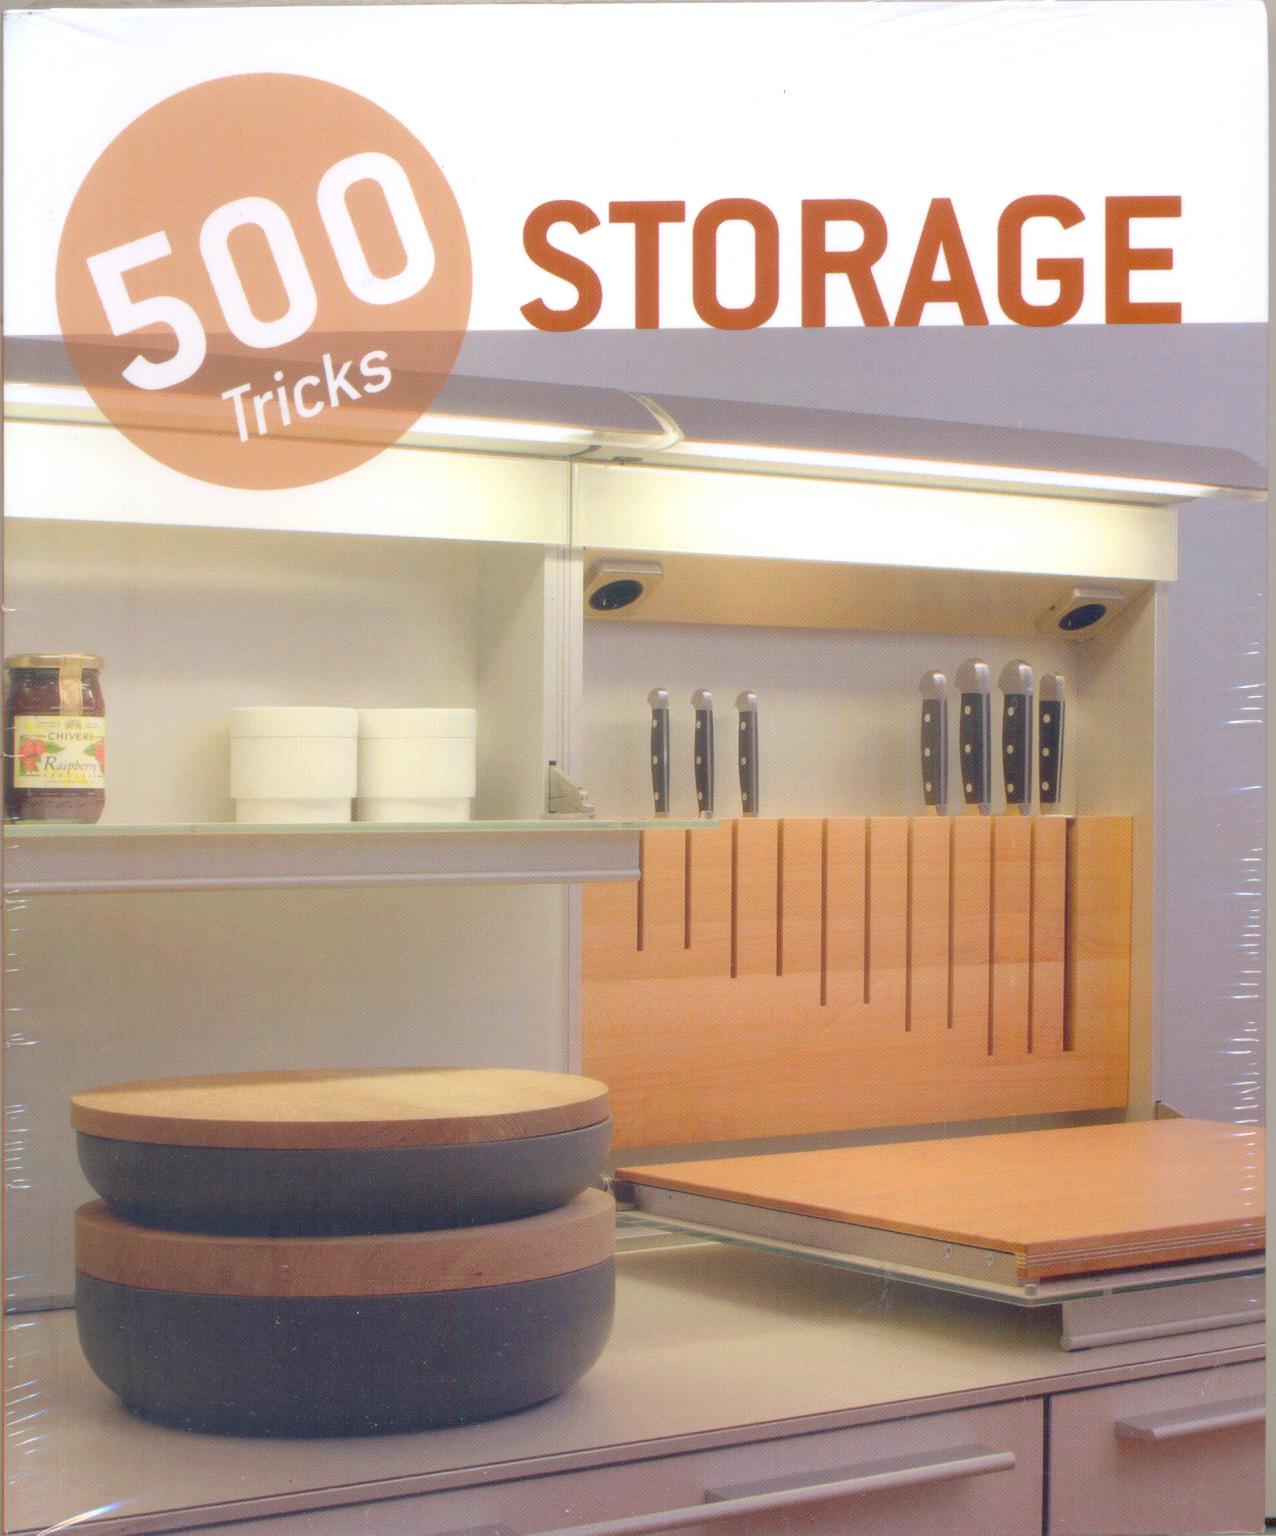 Storage - 500 Tricks